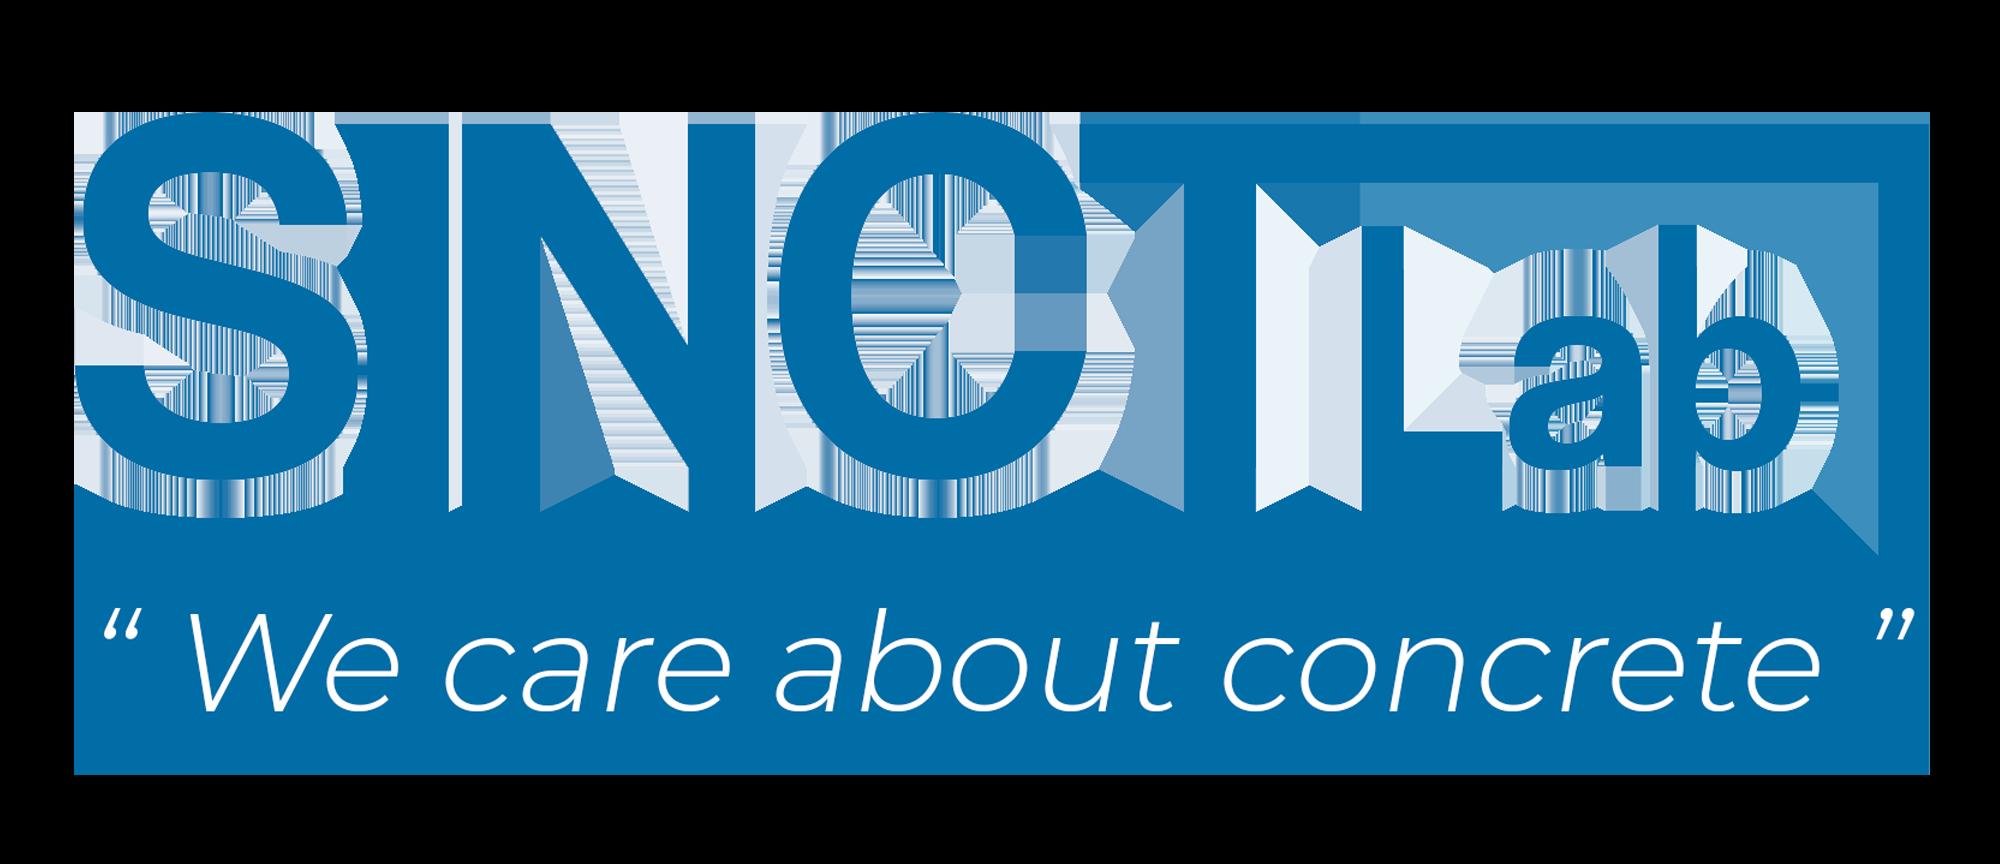 sinctlab logo trans horizontal